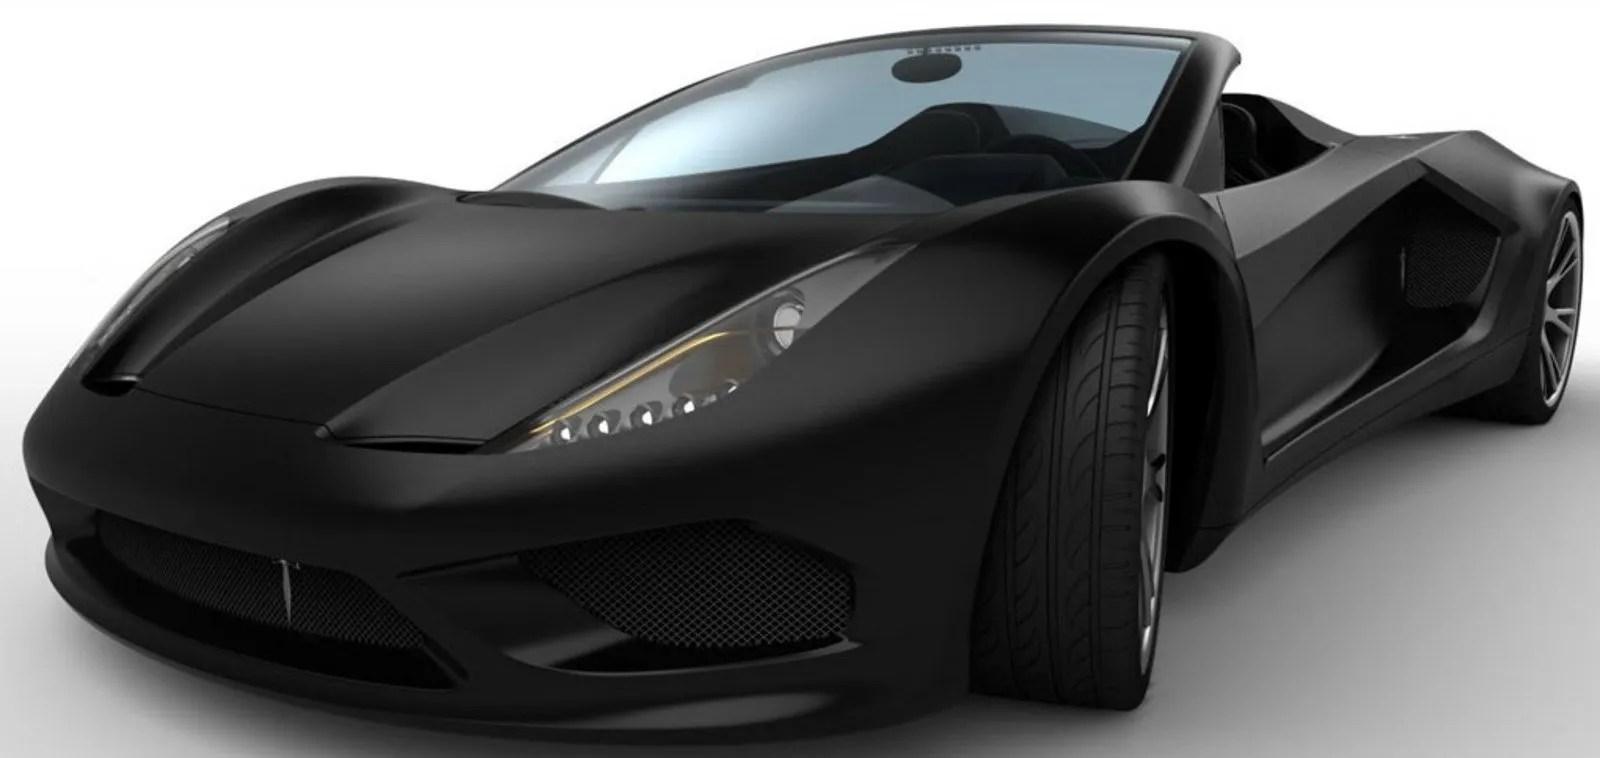 2012 TranStar Dagger GT D Outlaw Review Top Speed